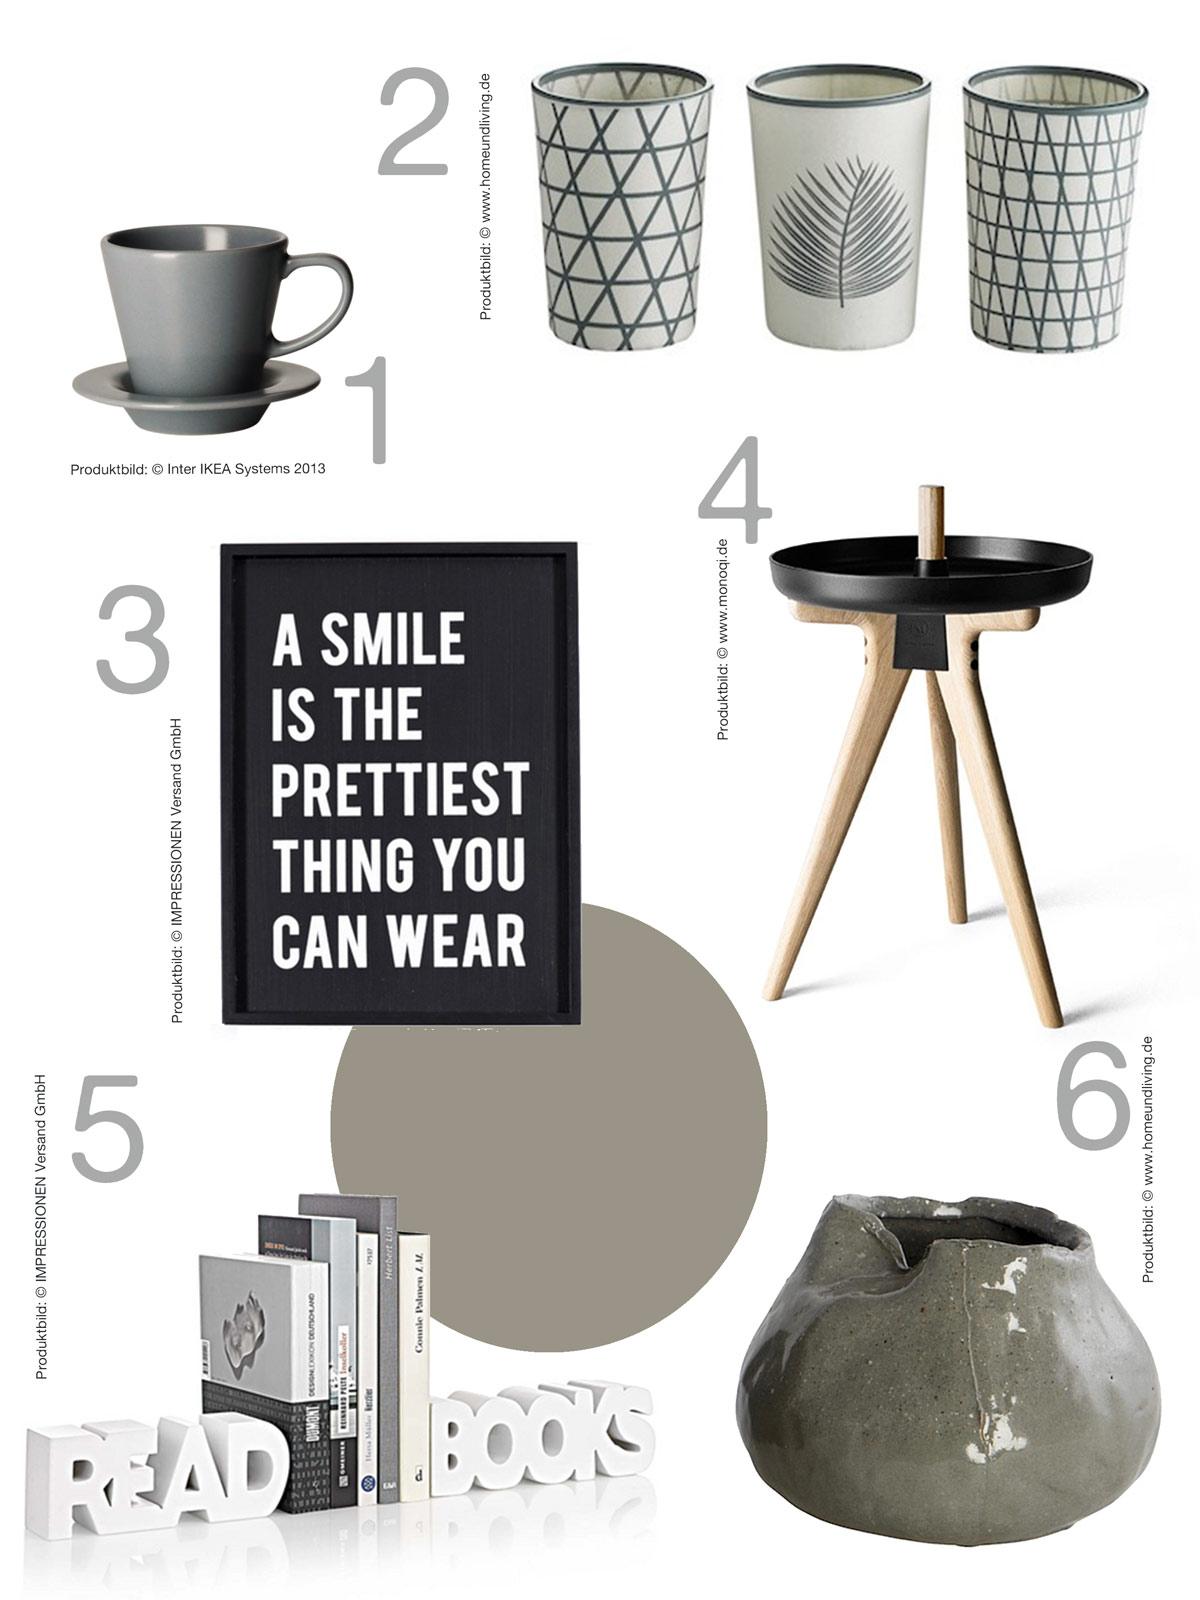 shopping archive seite 9 von 15 mxliving. Black Bedroom Furniture Sets. Home Design Ideas